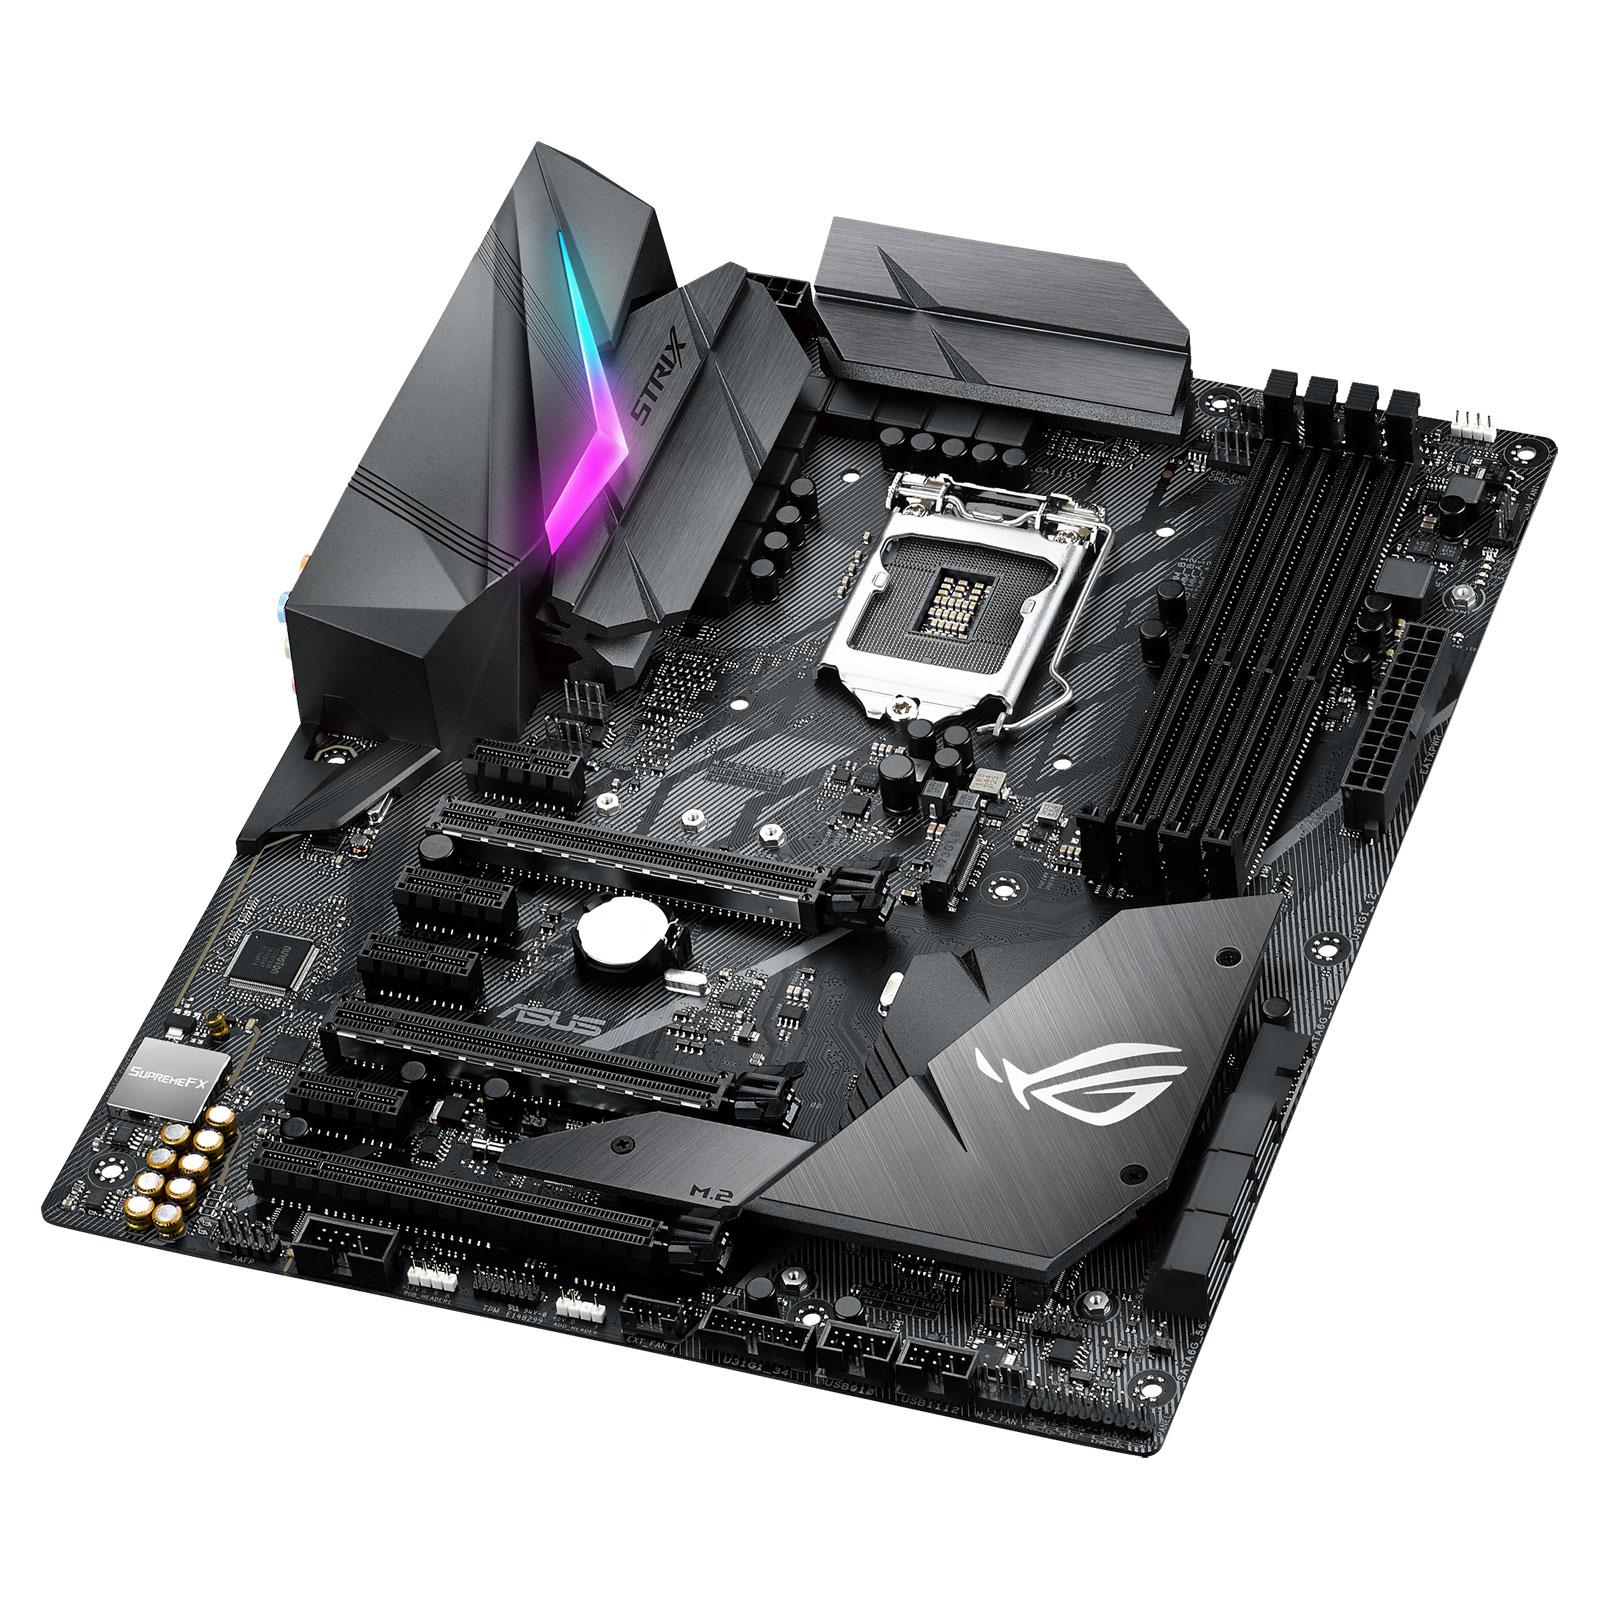 Pack carte mère Asus ROG Strix Z370-F Gaming + Watercooling CoolerMaster MasterLiquid ML240L RGB